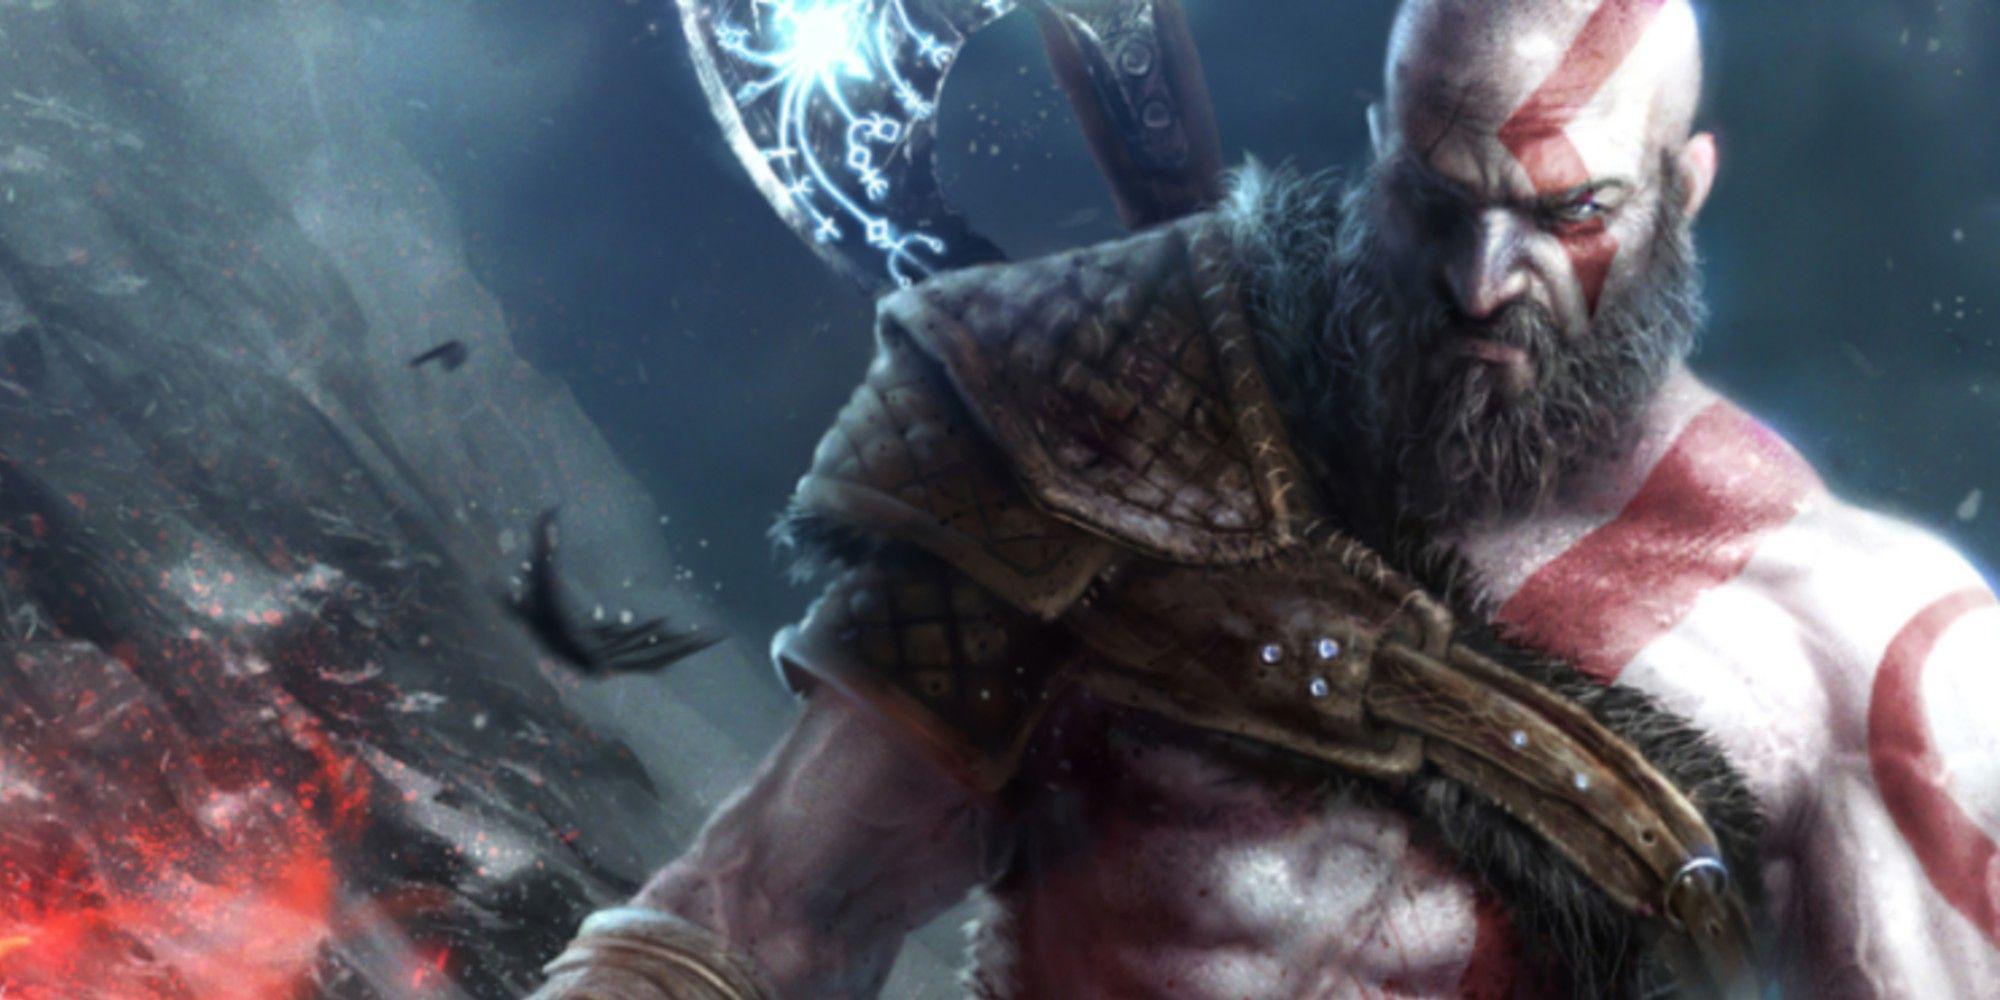 What order should I play the god of war games in? : GodofWar